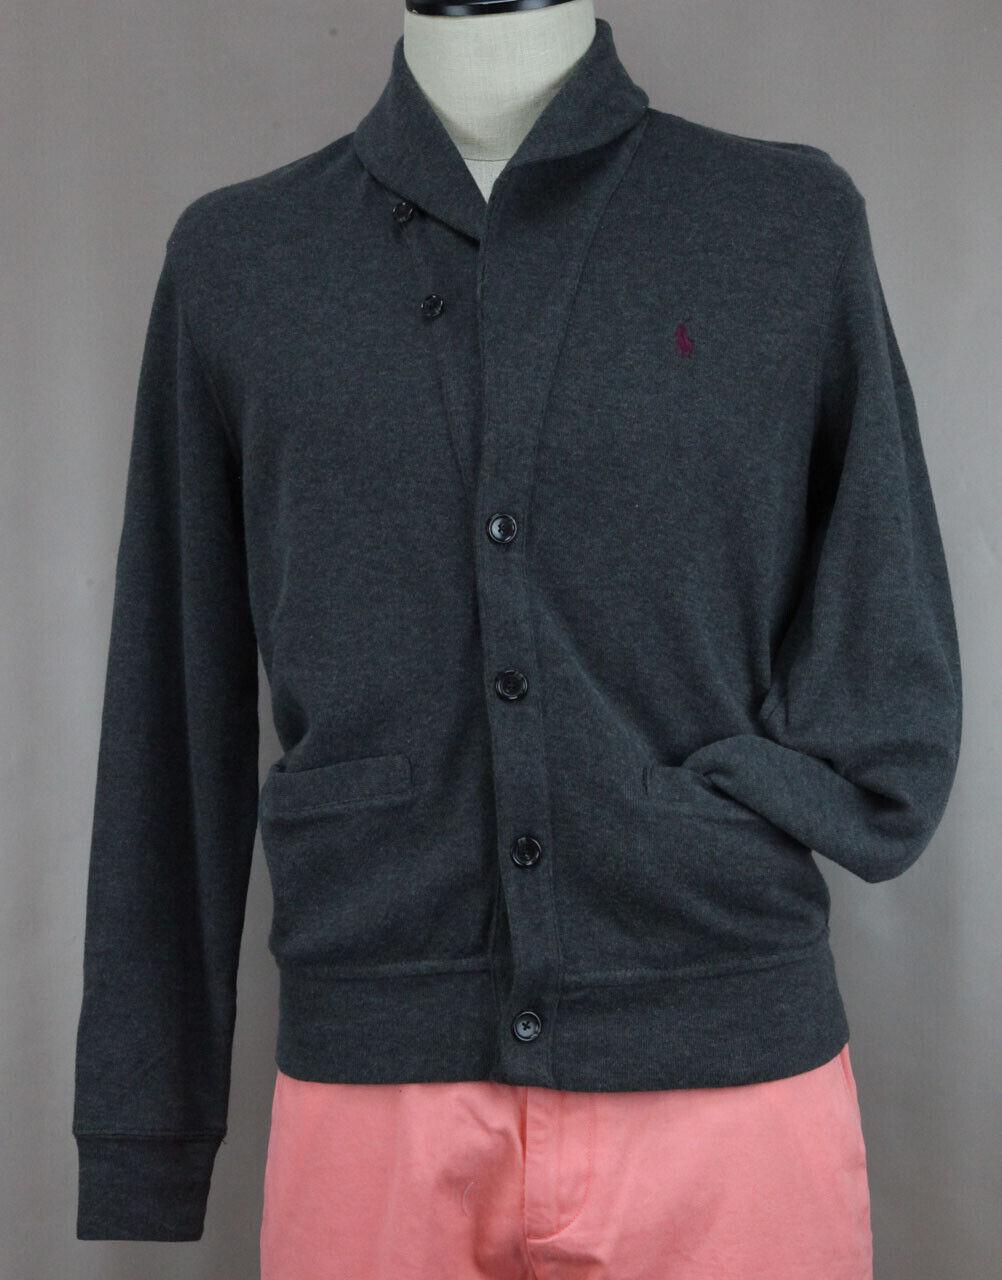 Polo Ralph Lauren Men/'s Heather Gray Cotton Button Up Sweater Ret $115 New